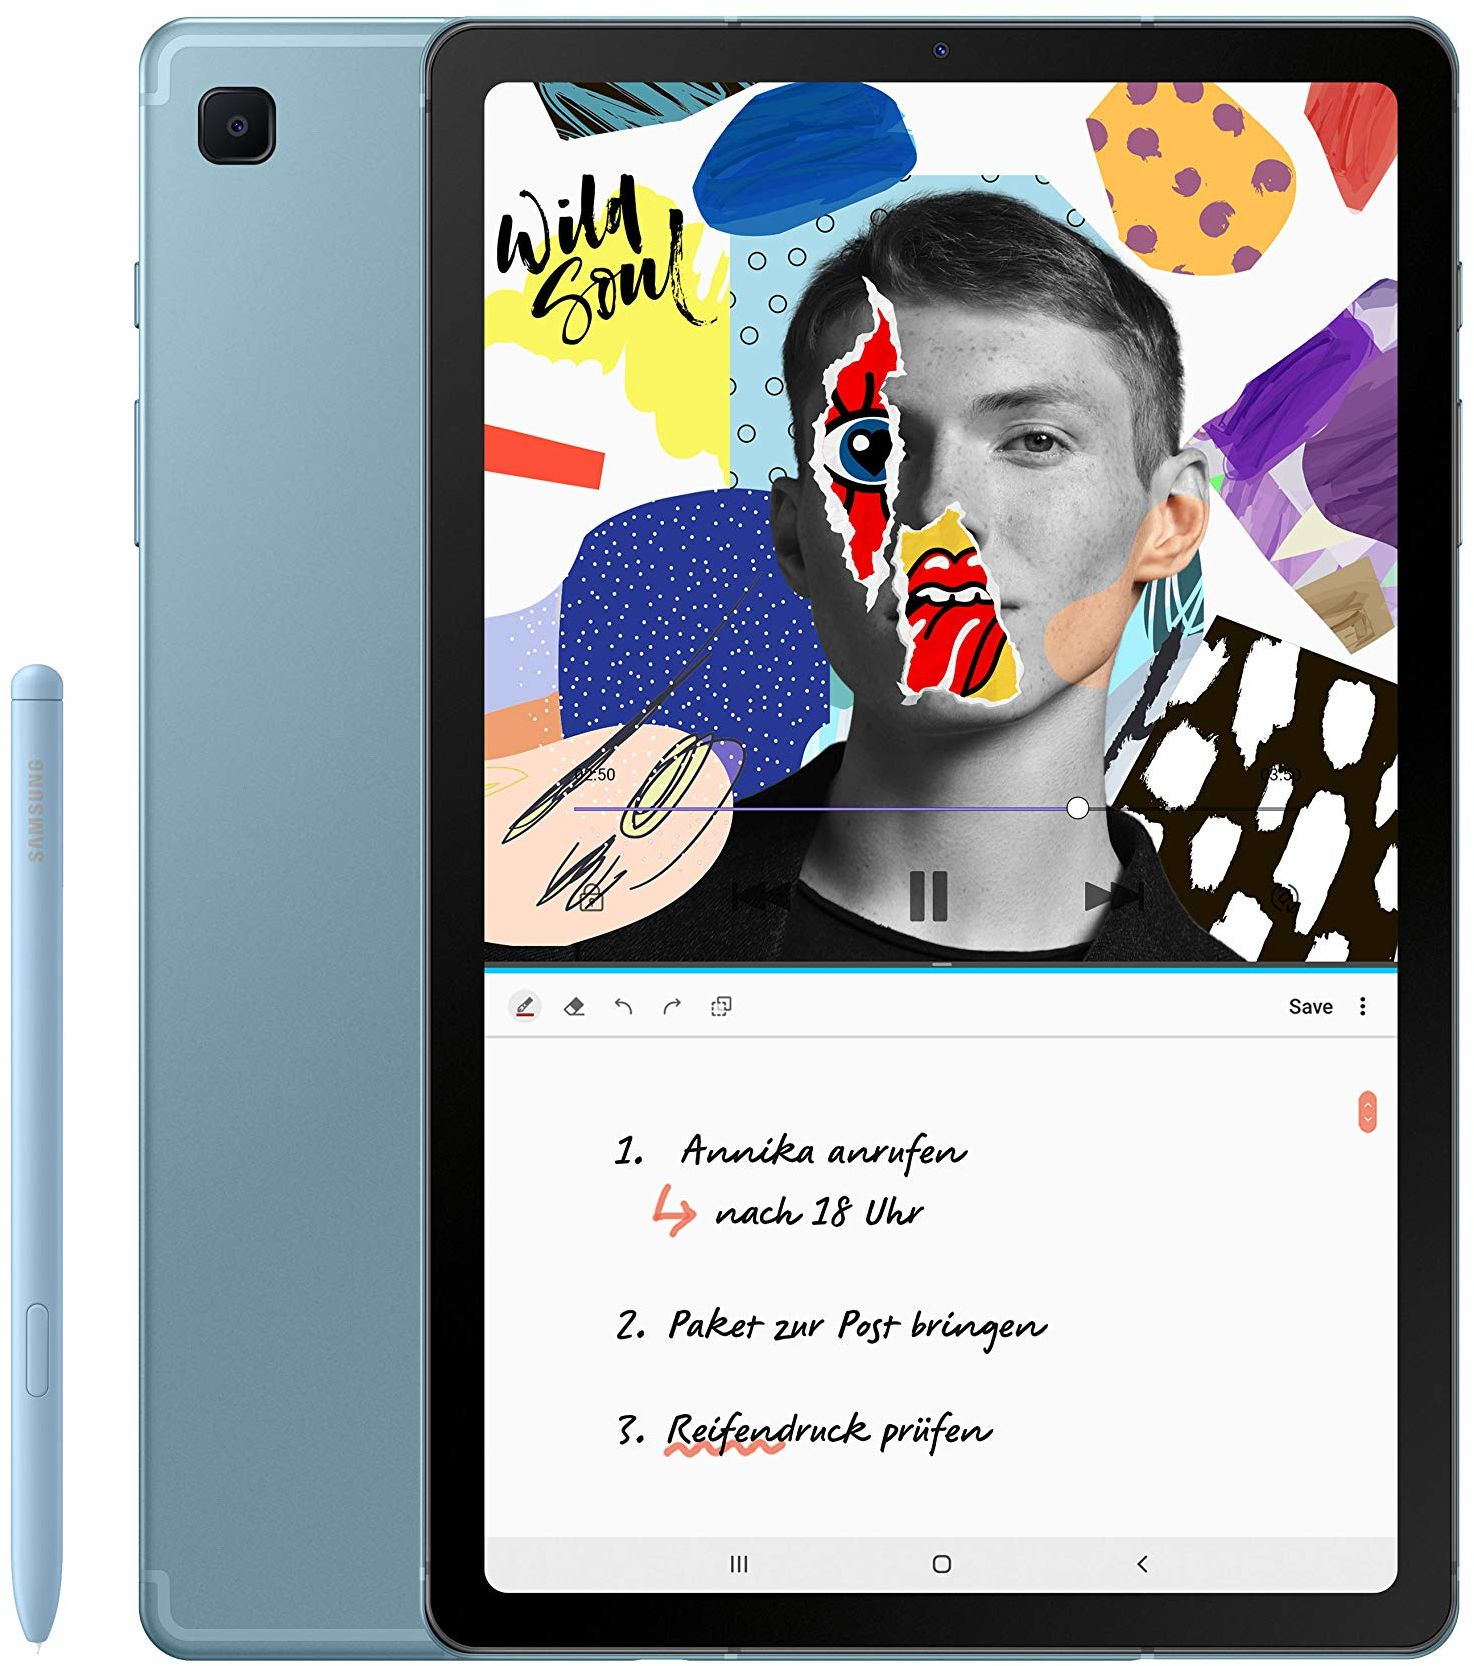 Samsung, Galaxy Tab S6 Lite (LTE) 10.4 Cala, Tablet z Rysikiem, 4 GB, 64 GB, Android 10.0, Niebieski